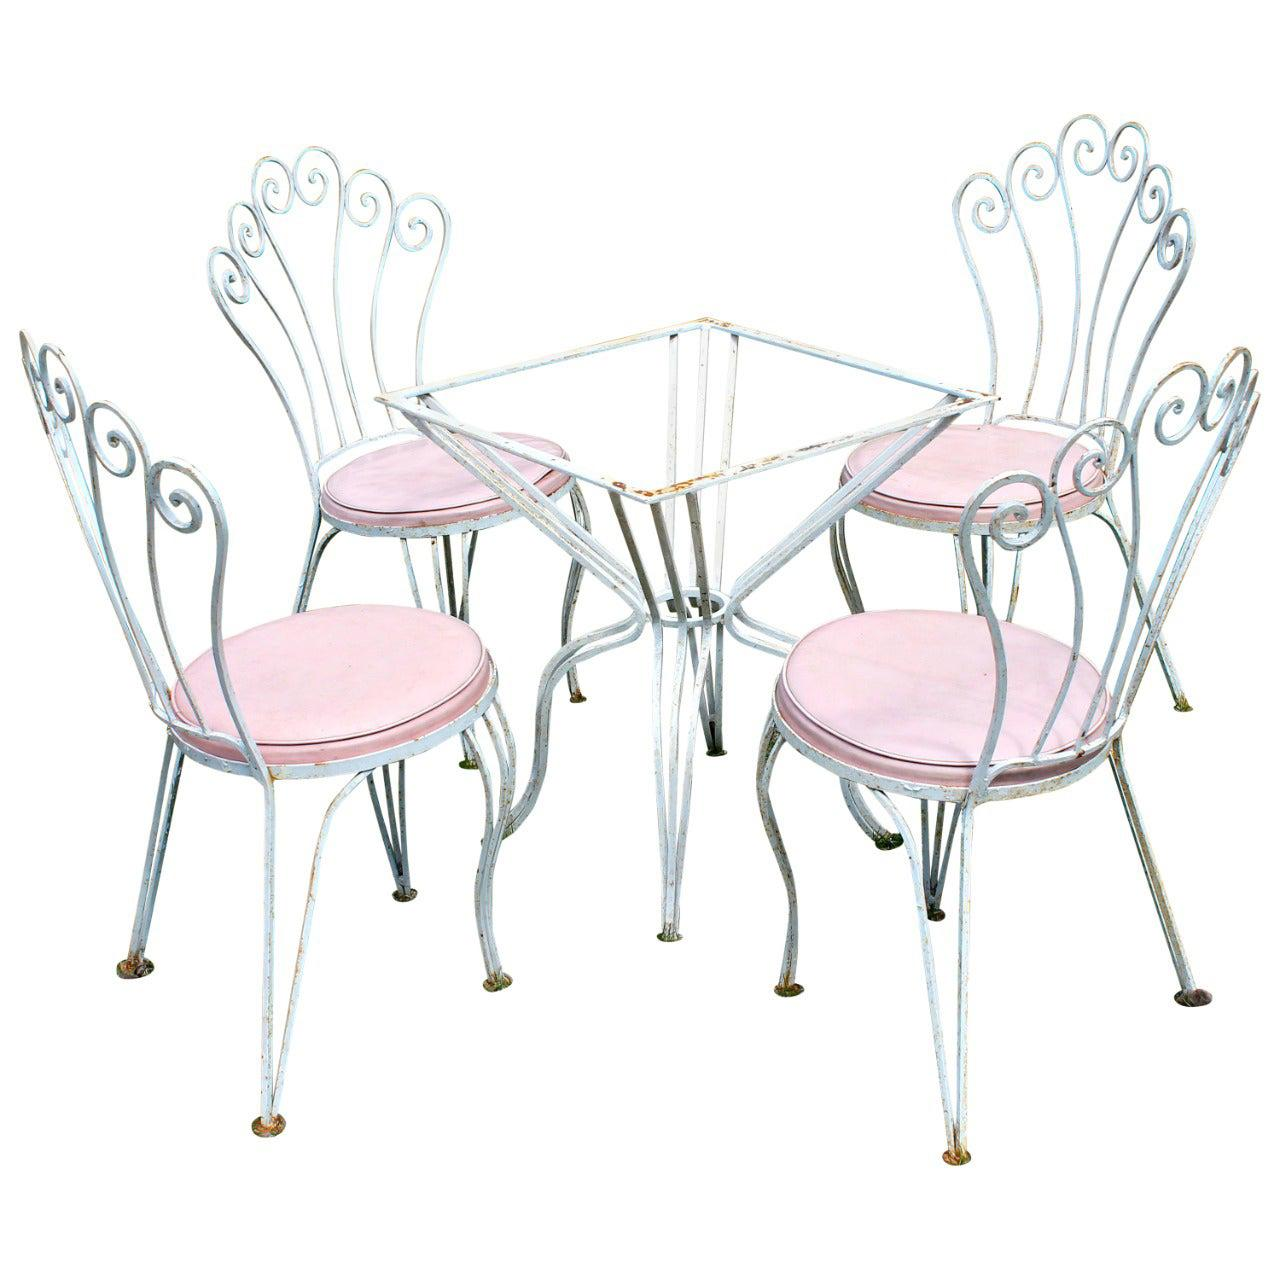 Rene Prou Style Wrought Iron Patio Set